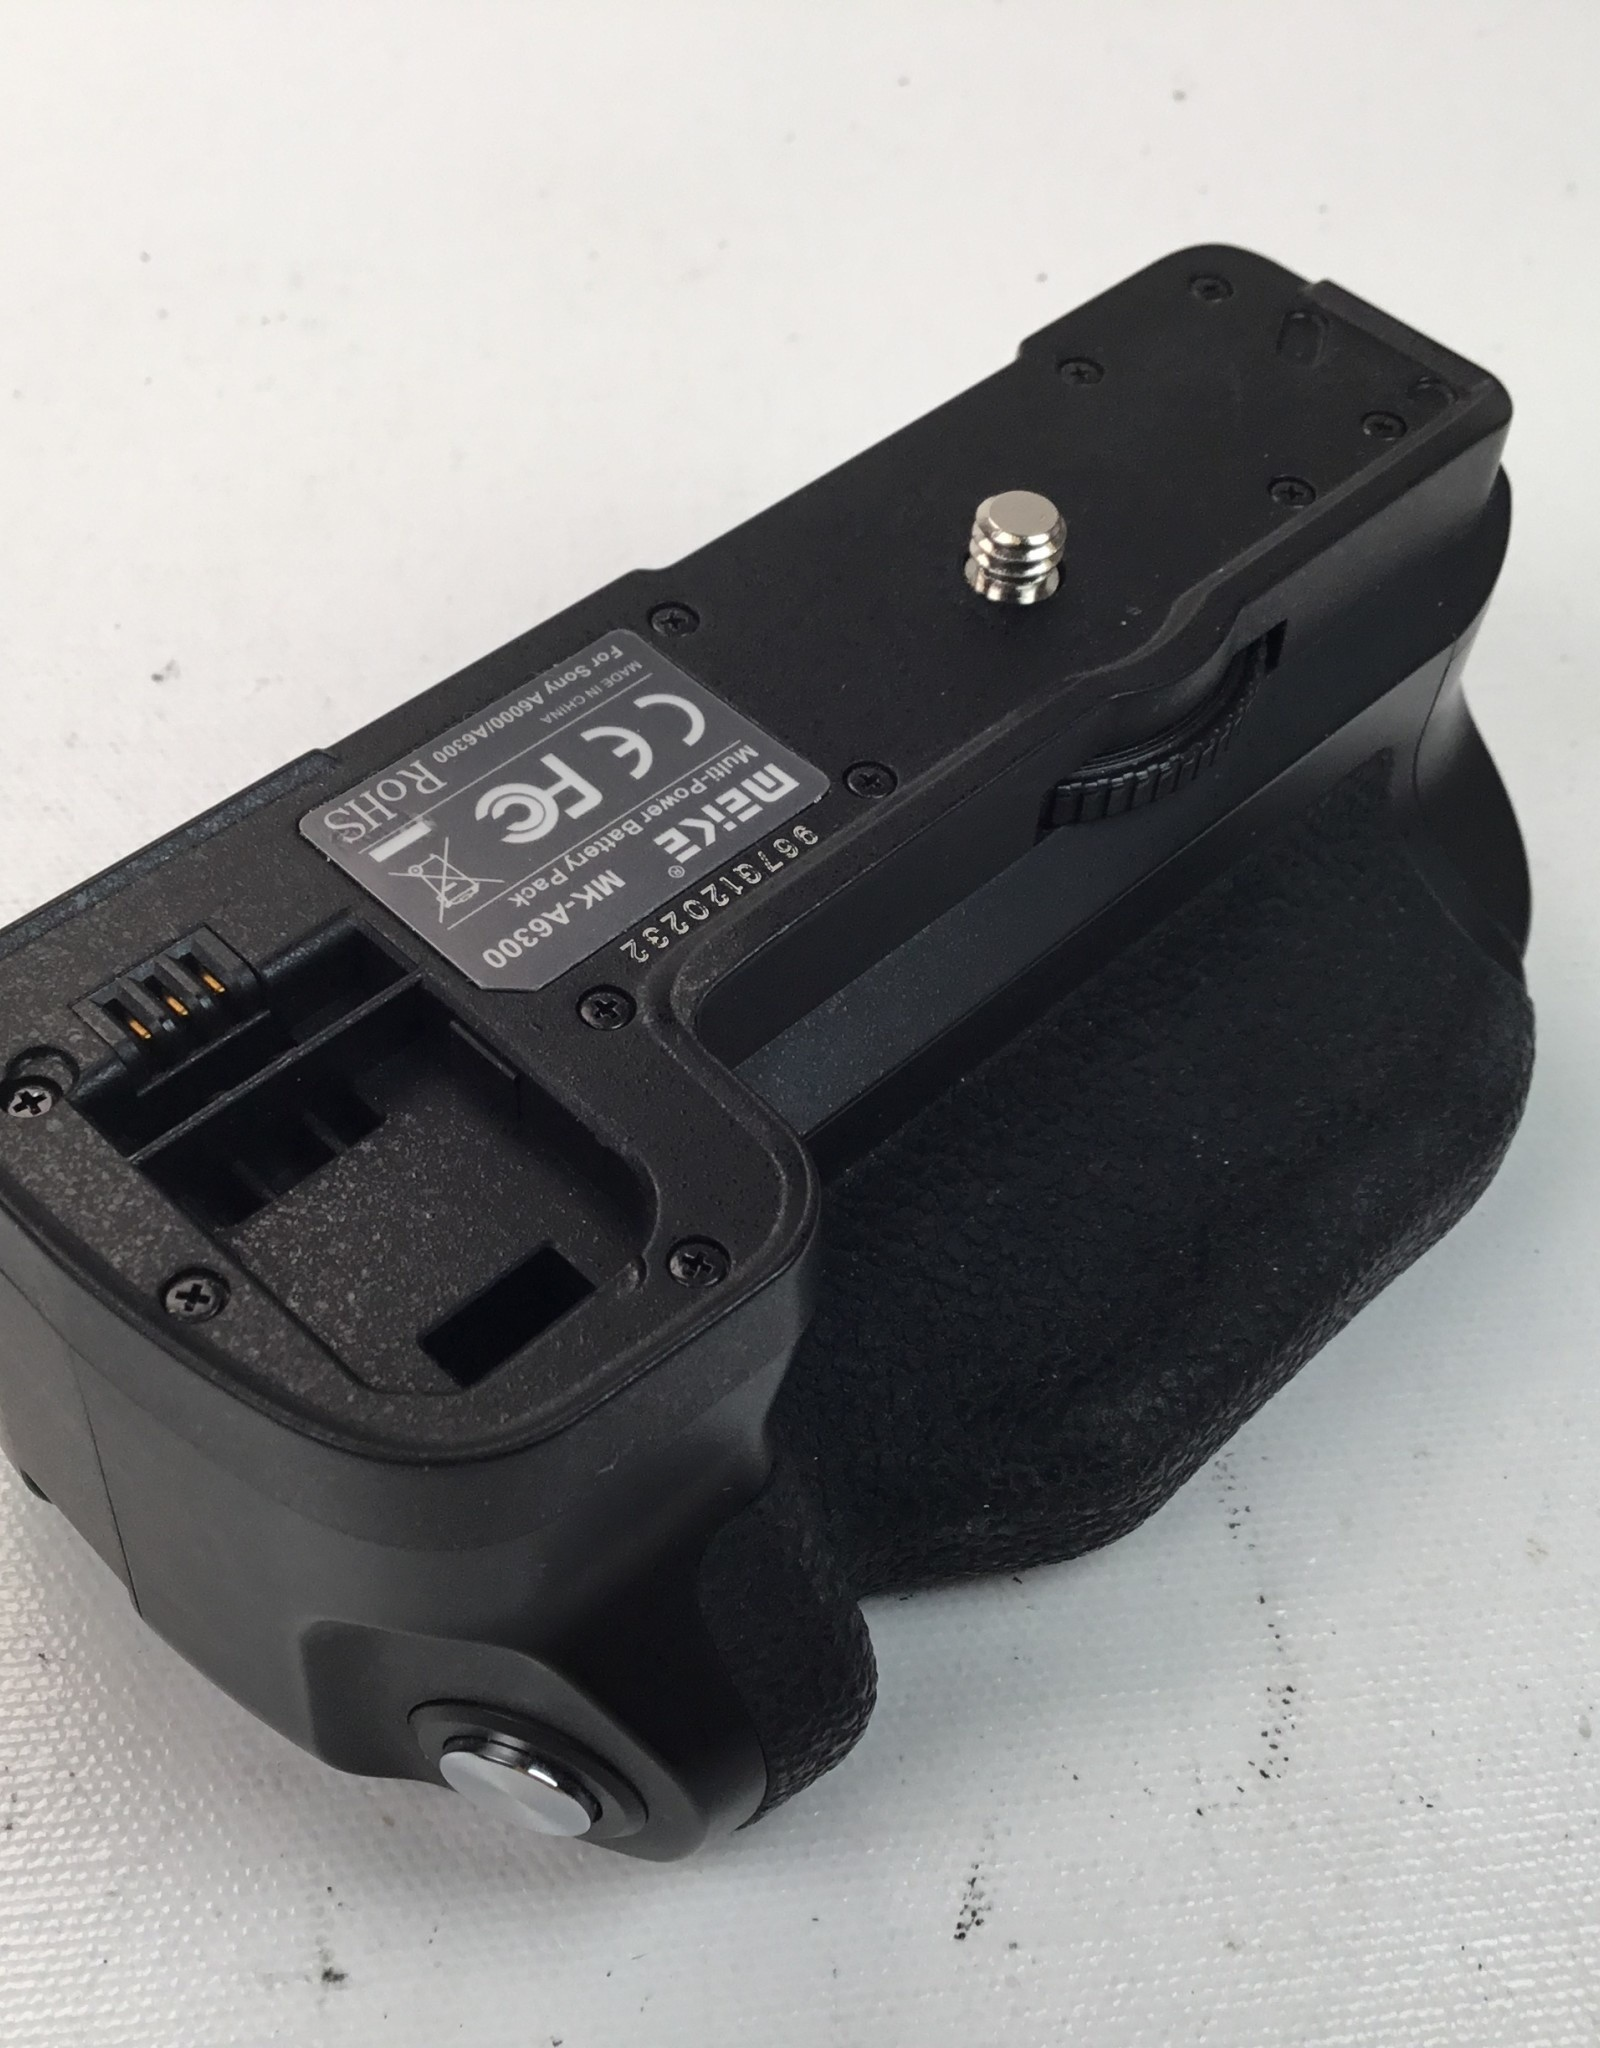 Meike Meike MK-A6300 Grip for Sony a6300 Camera Used EX